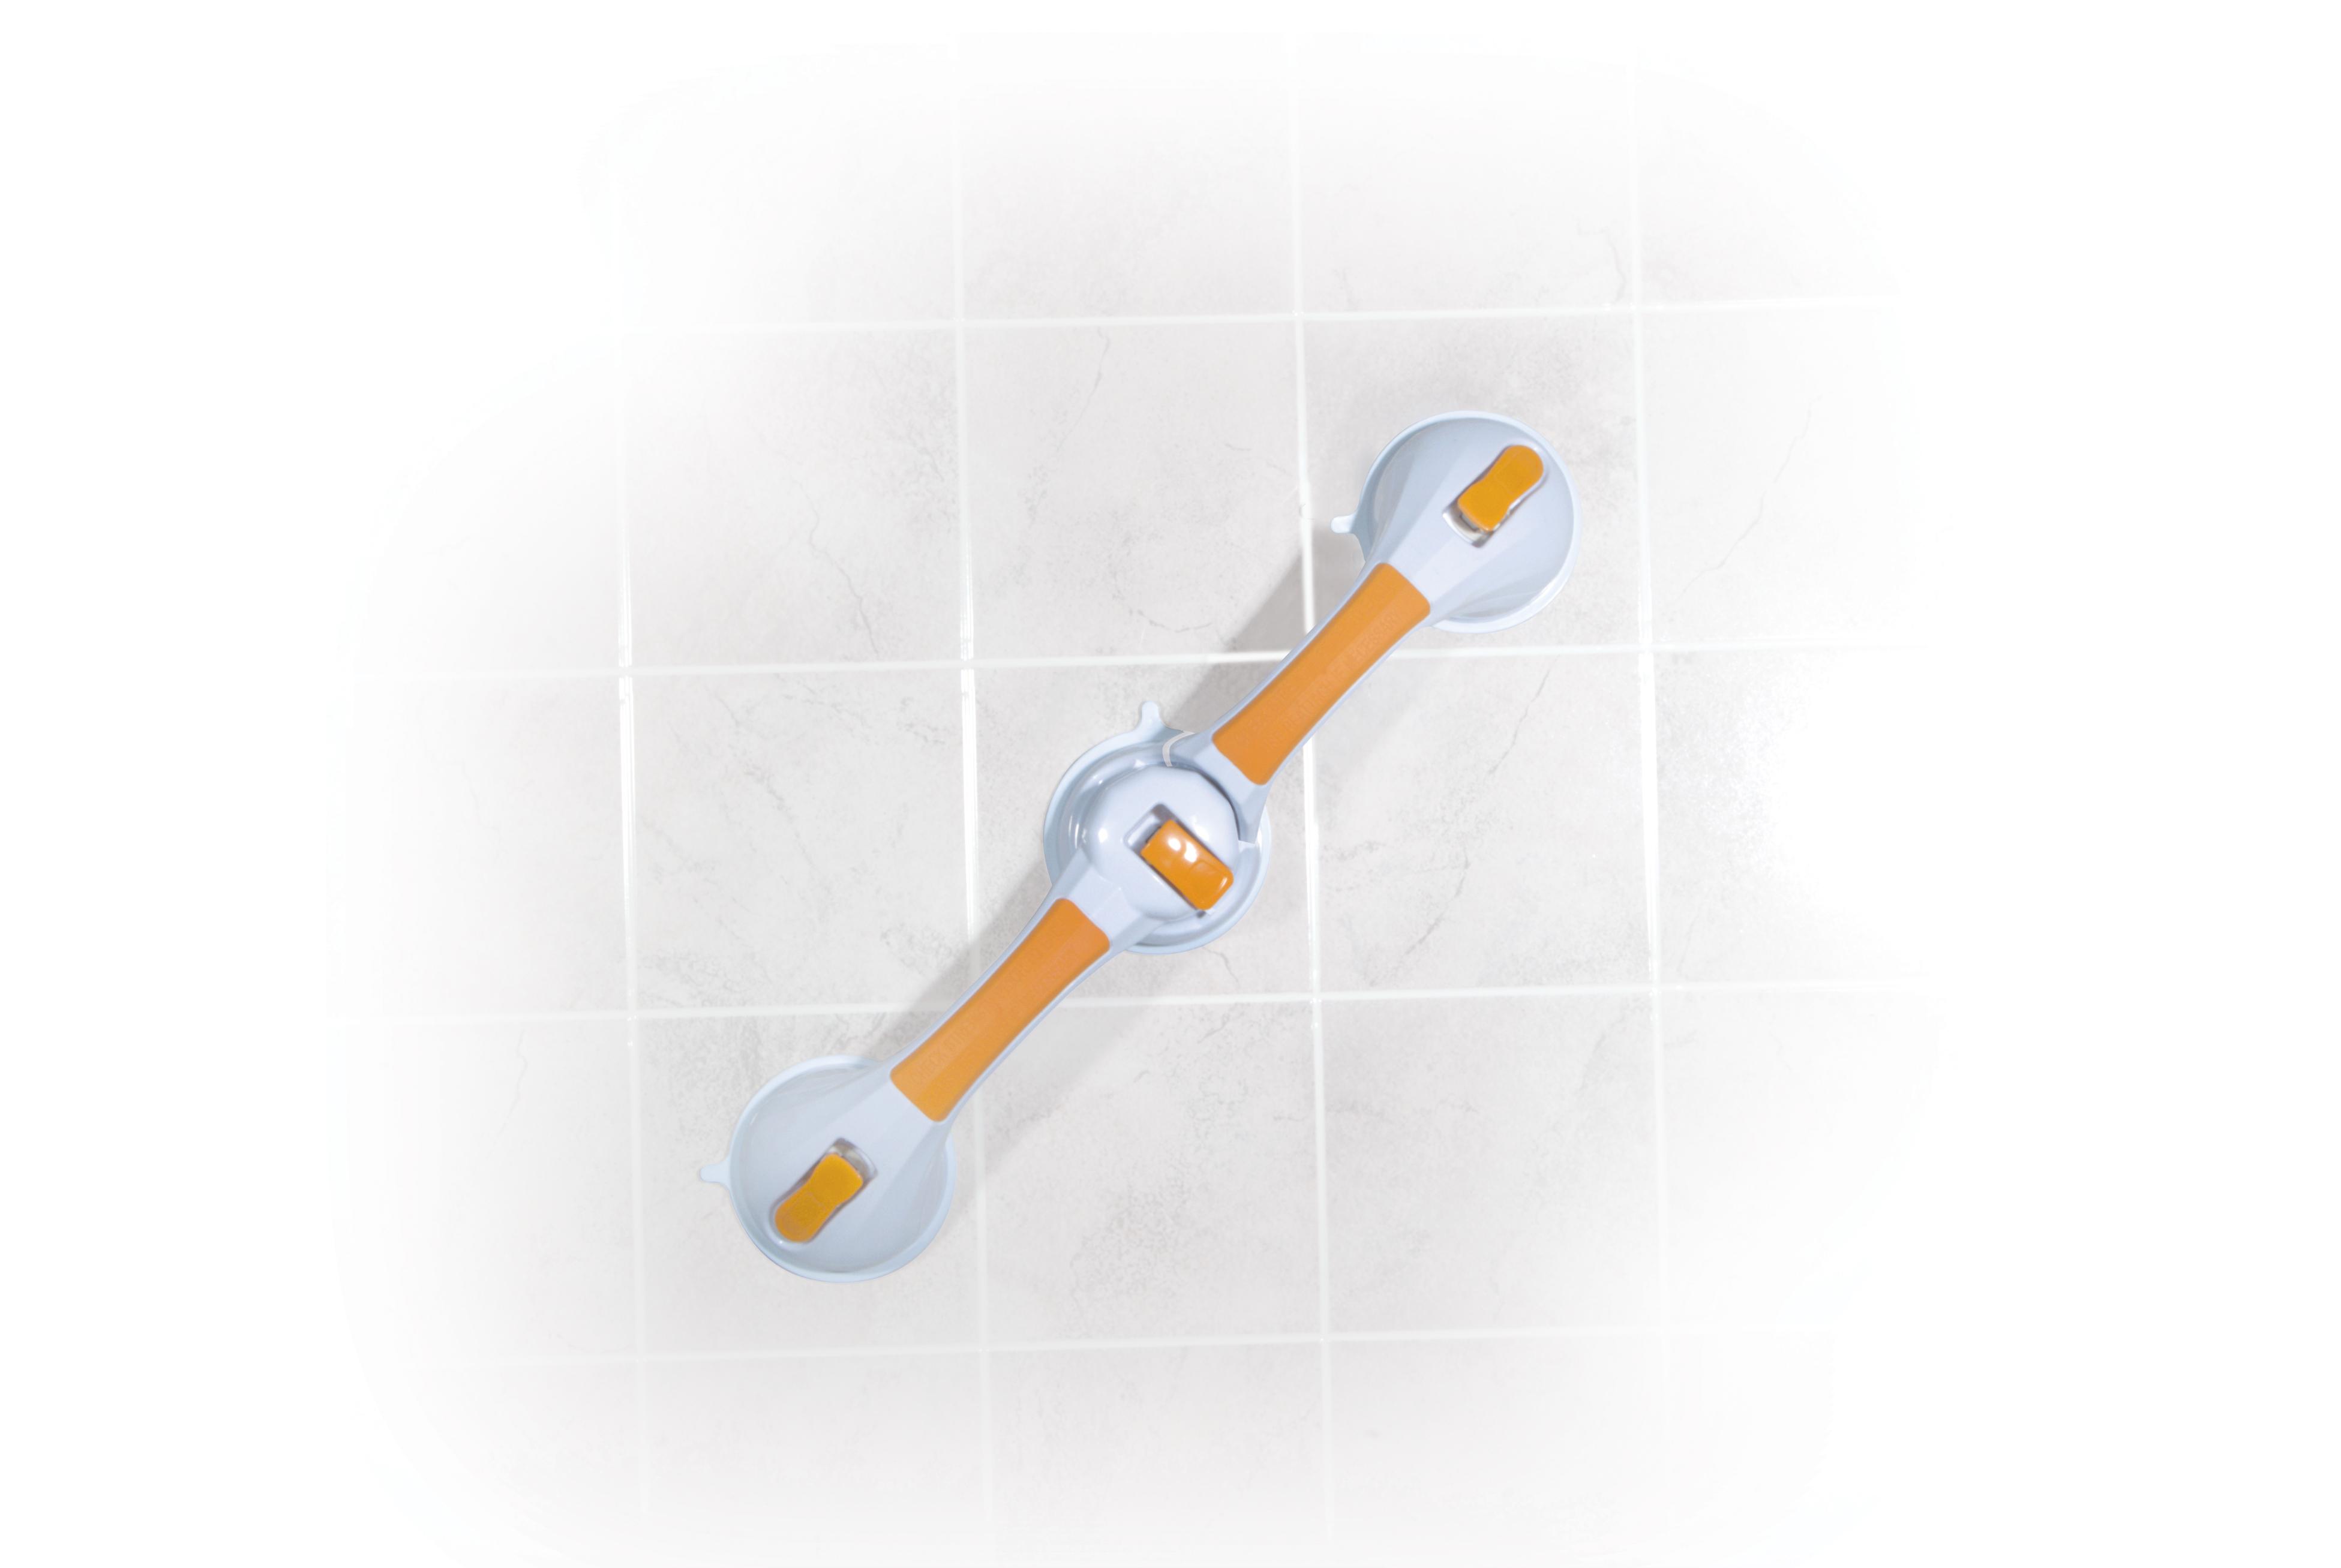 bathroom-safety-solution-bathbundle-drive-medical-6.jpg